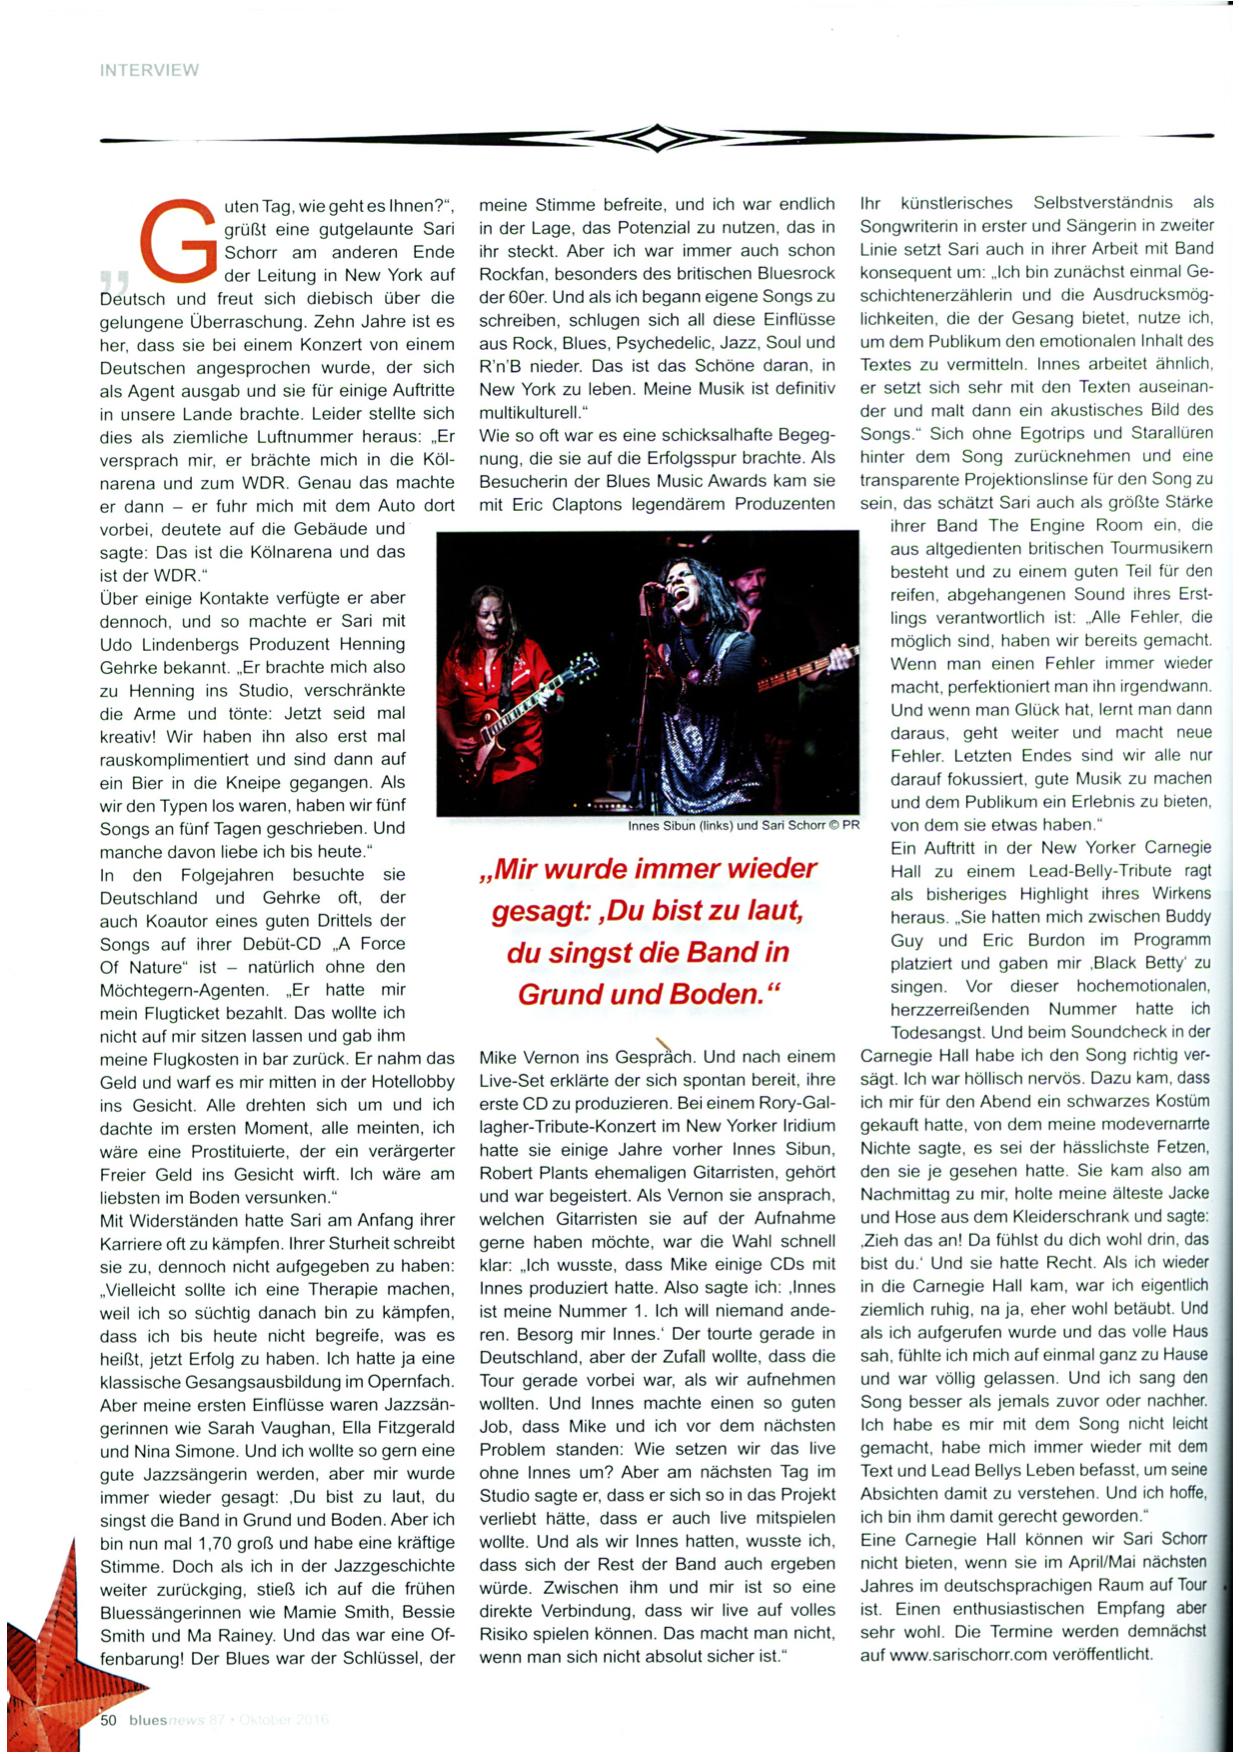 article_sari_schorr_bluesnews87_oct2016.jpg